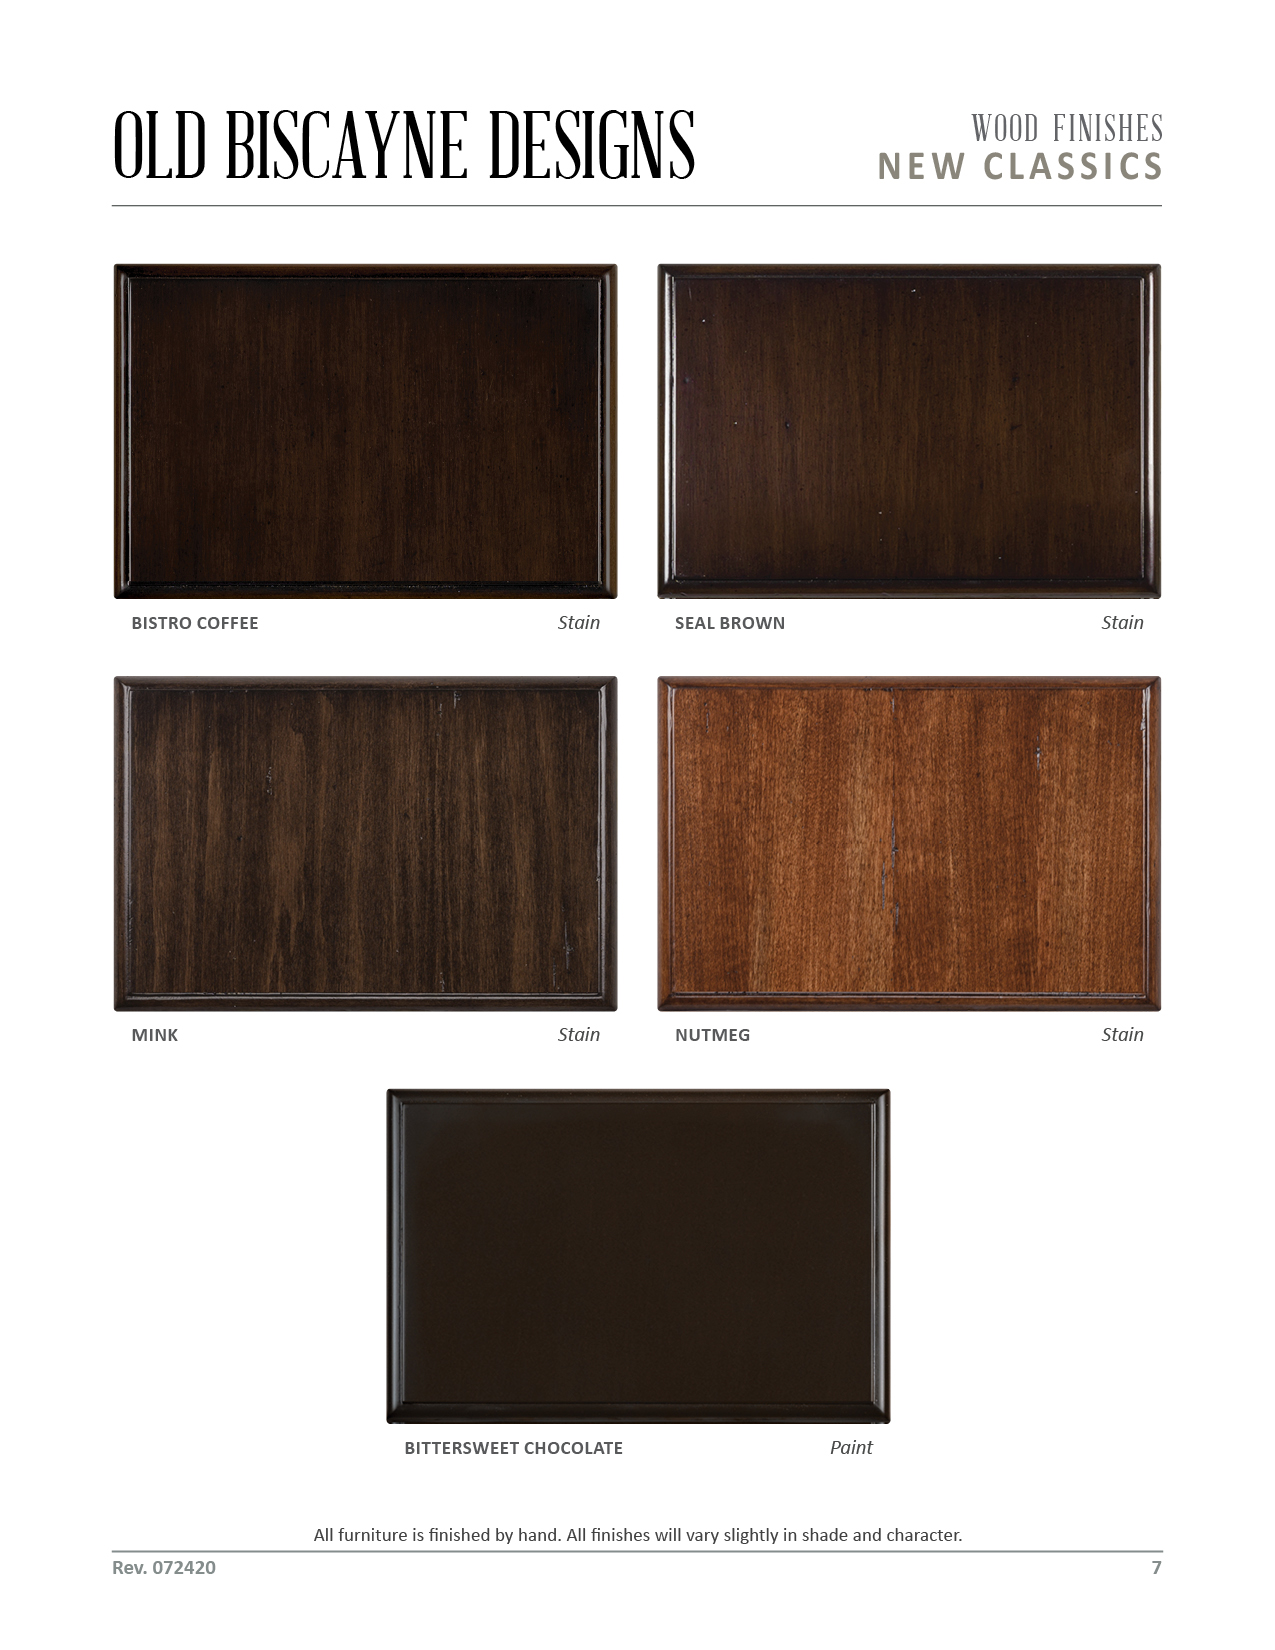 Wood Finishes 07. Old Biscayne Designs